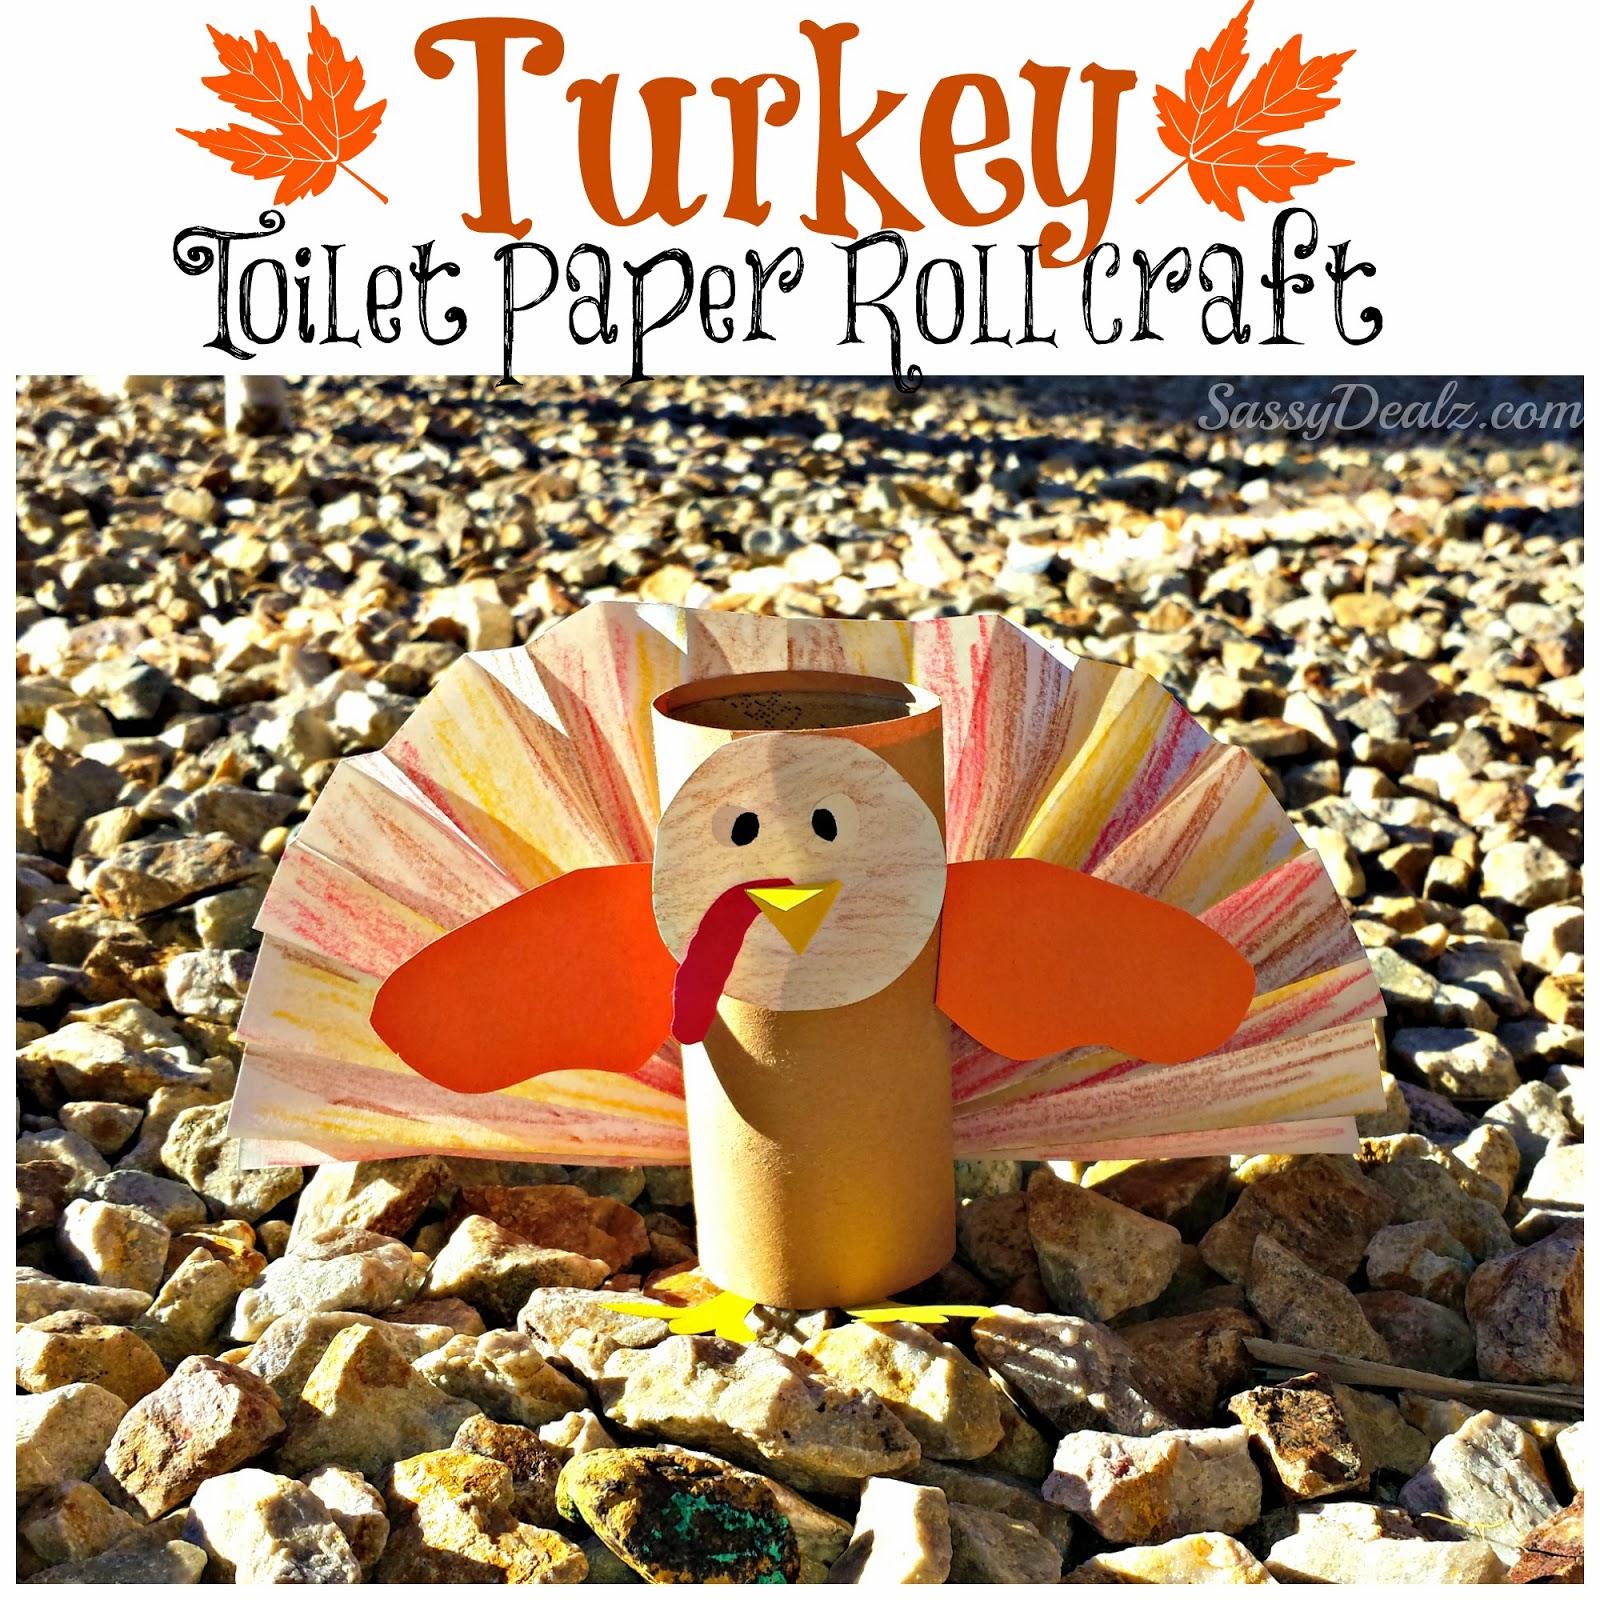 Turkey Toilet Paper Roll Craft For Kids Thanksgiving Art